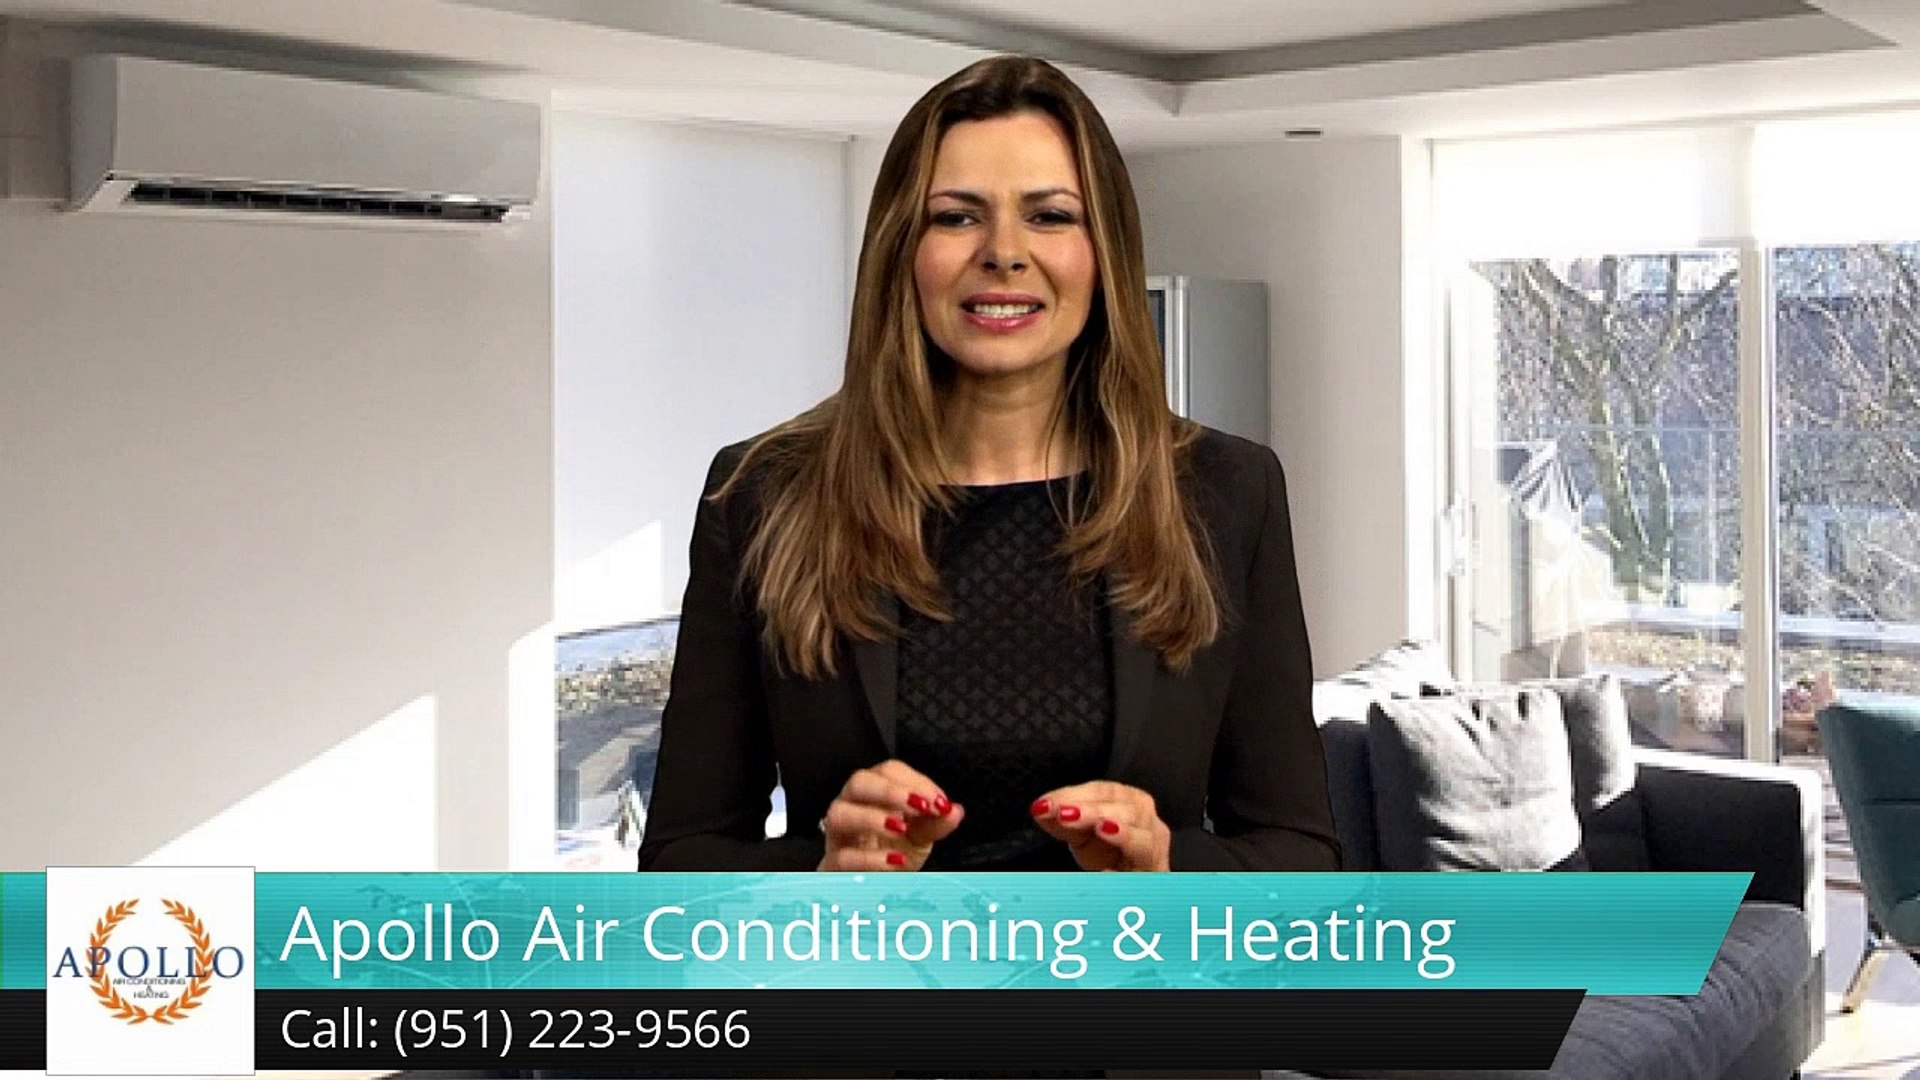 Corona Best Heating Repair – Apollo Air Conditioning & Heating - Corona Outstanding Five Star...